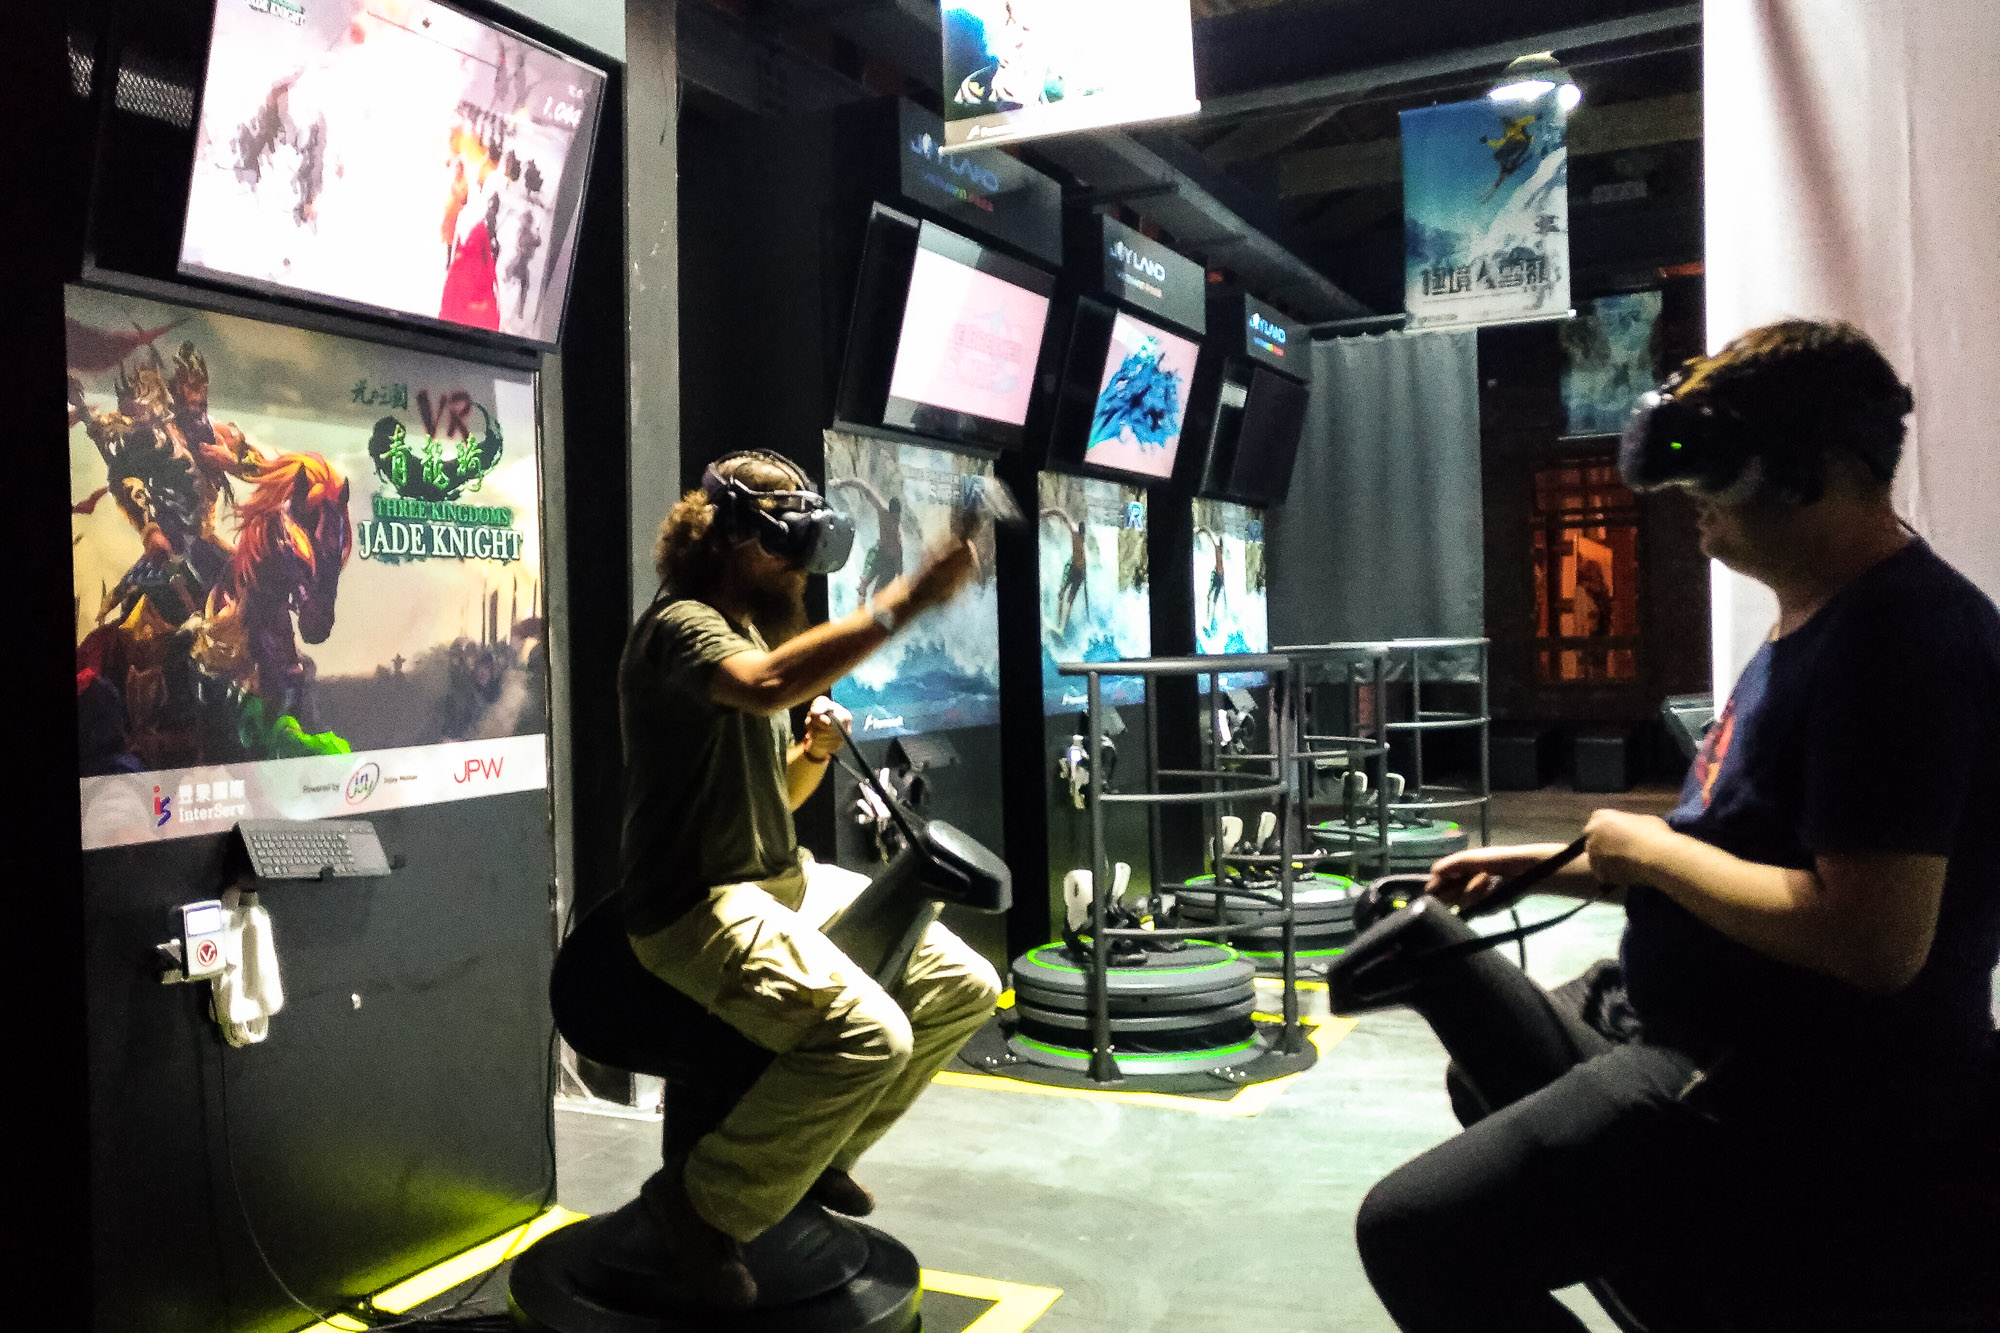 trying VR